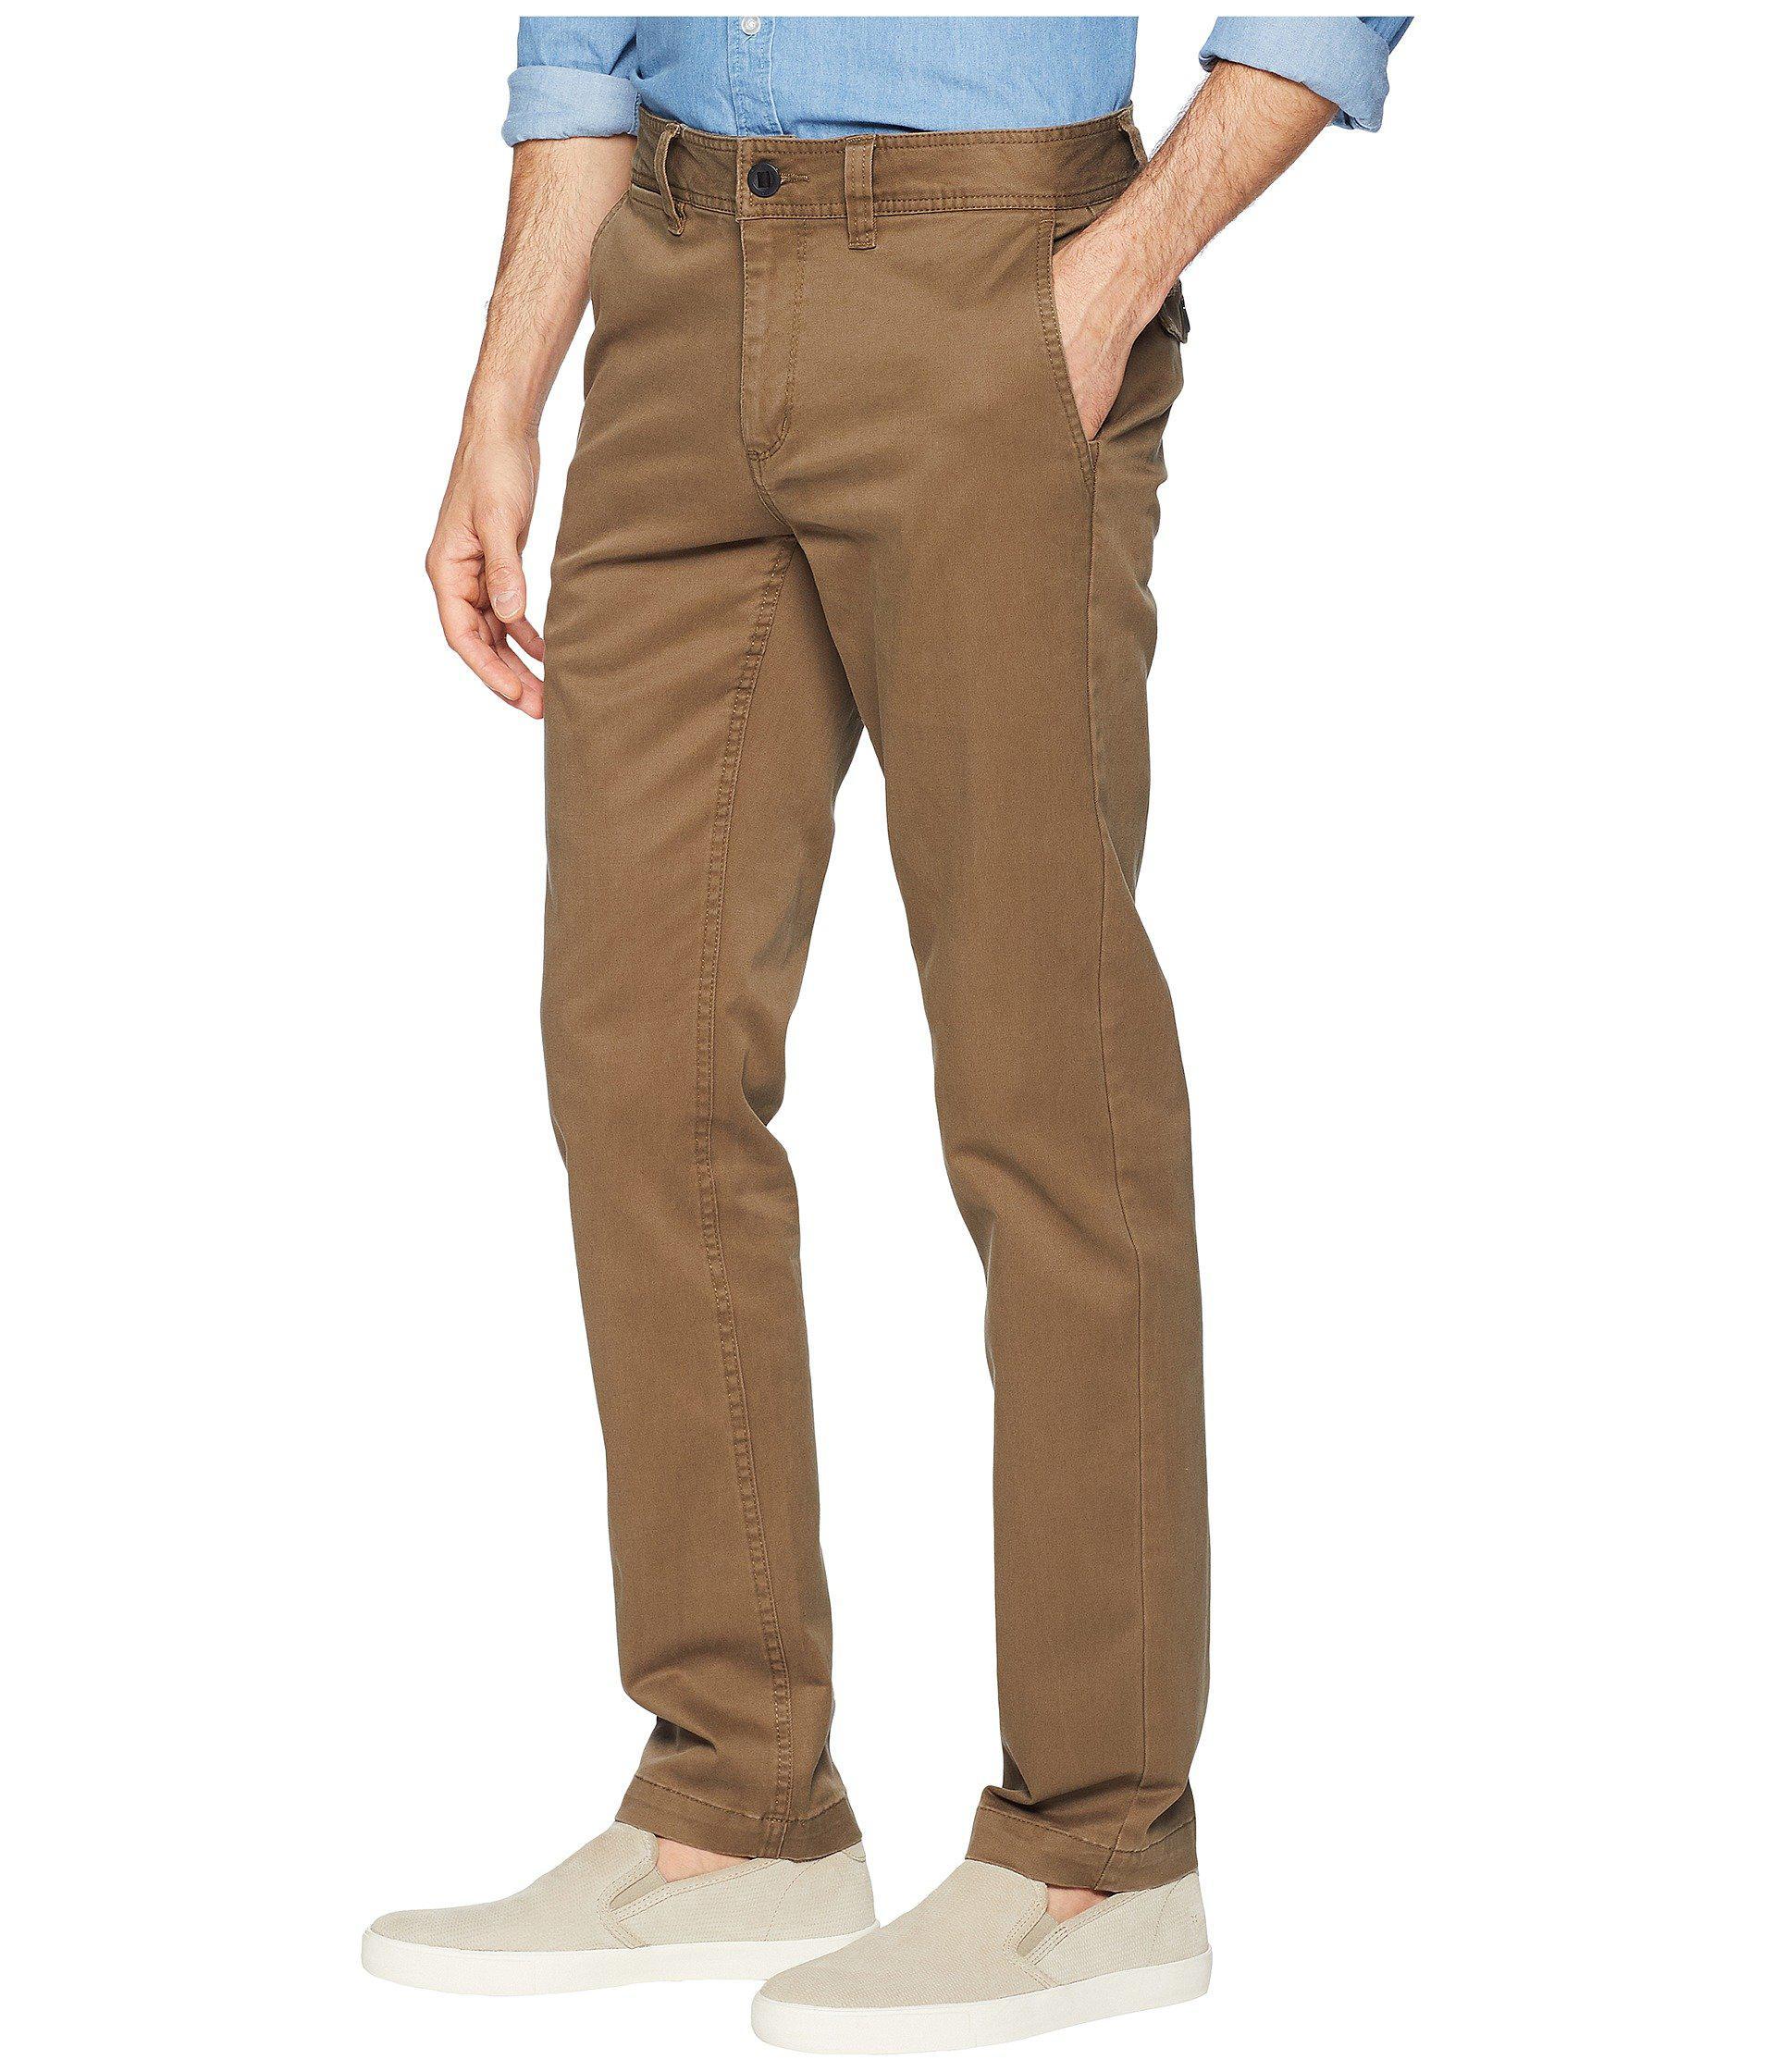 2bfa814a63db Lyst - O'neill Sportswear Mission Stretch Modern Fit Chino Pants for Men